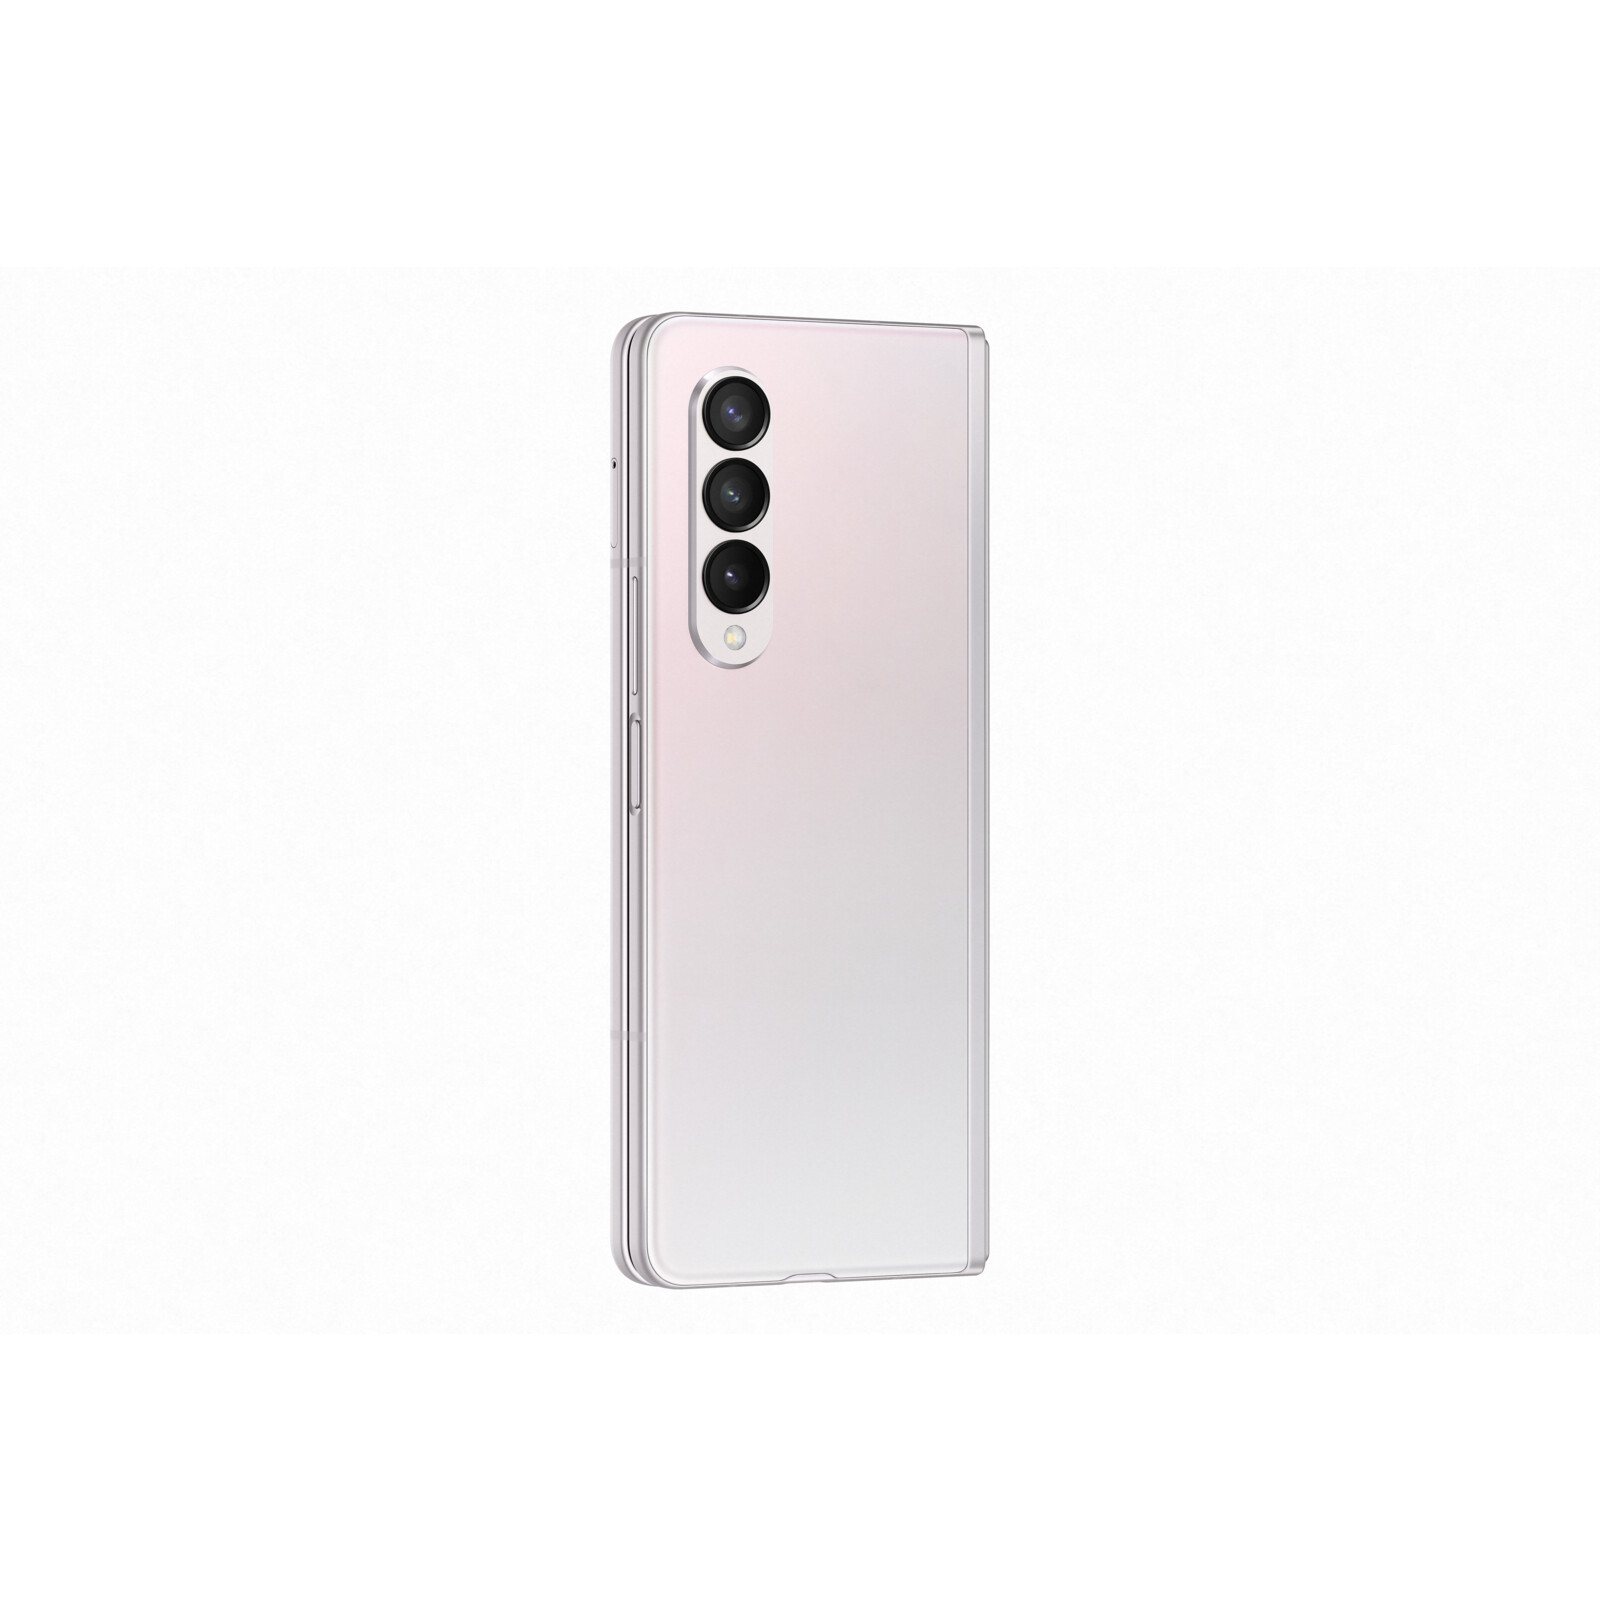 Samsung Galaxy Z Fold phanom silver